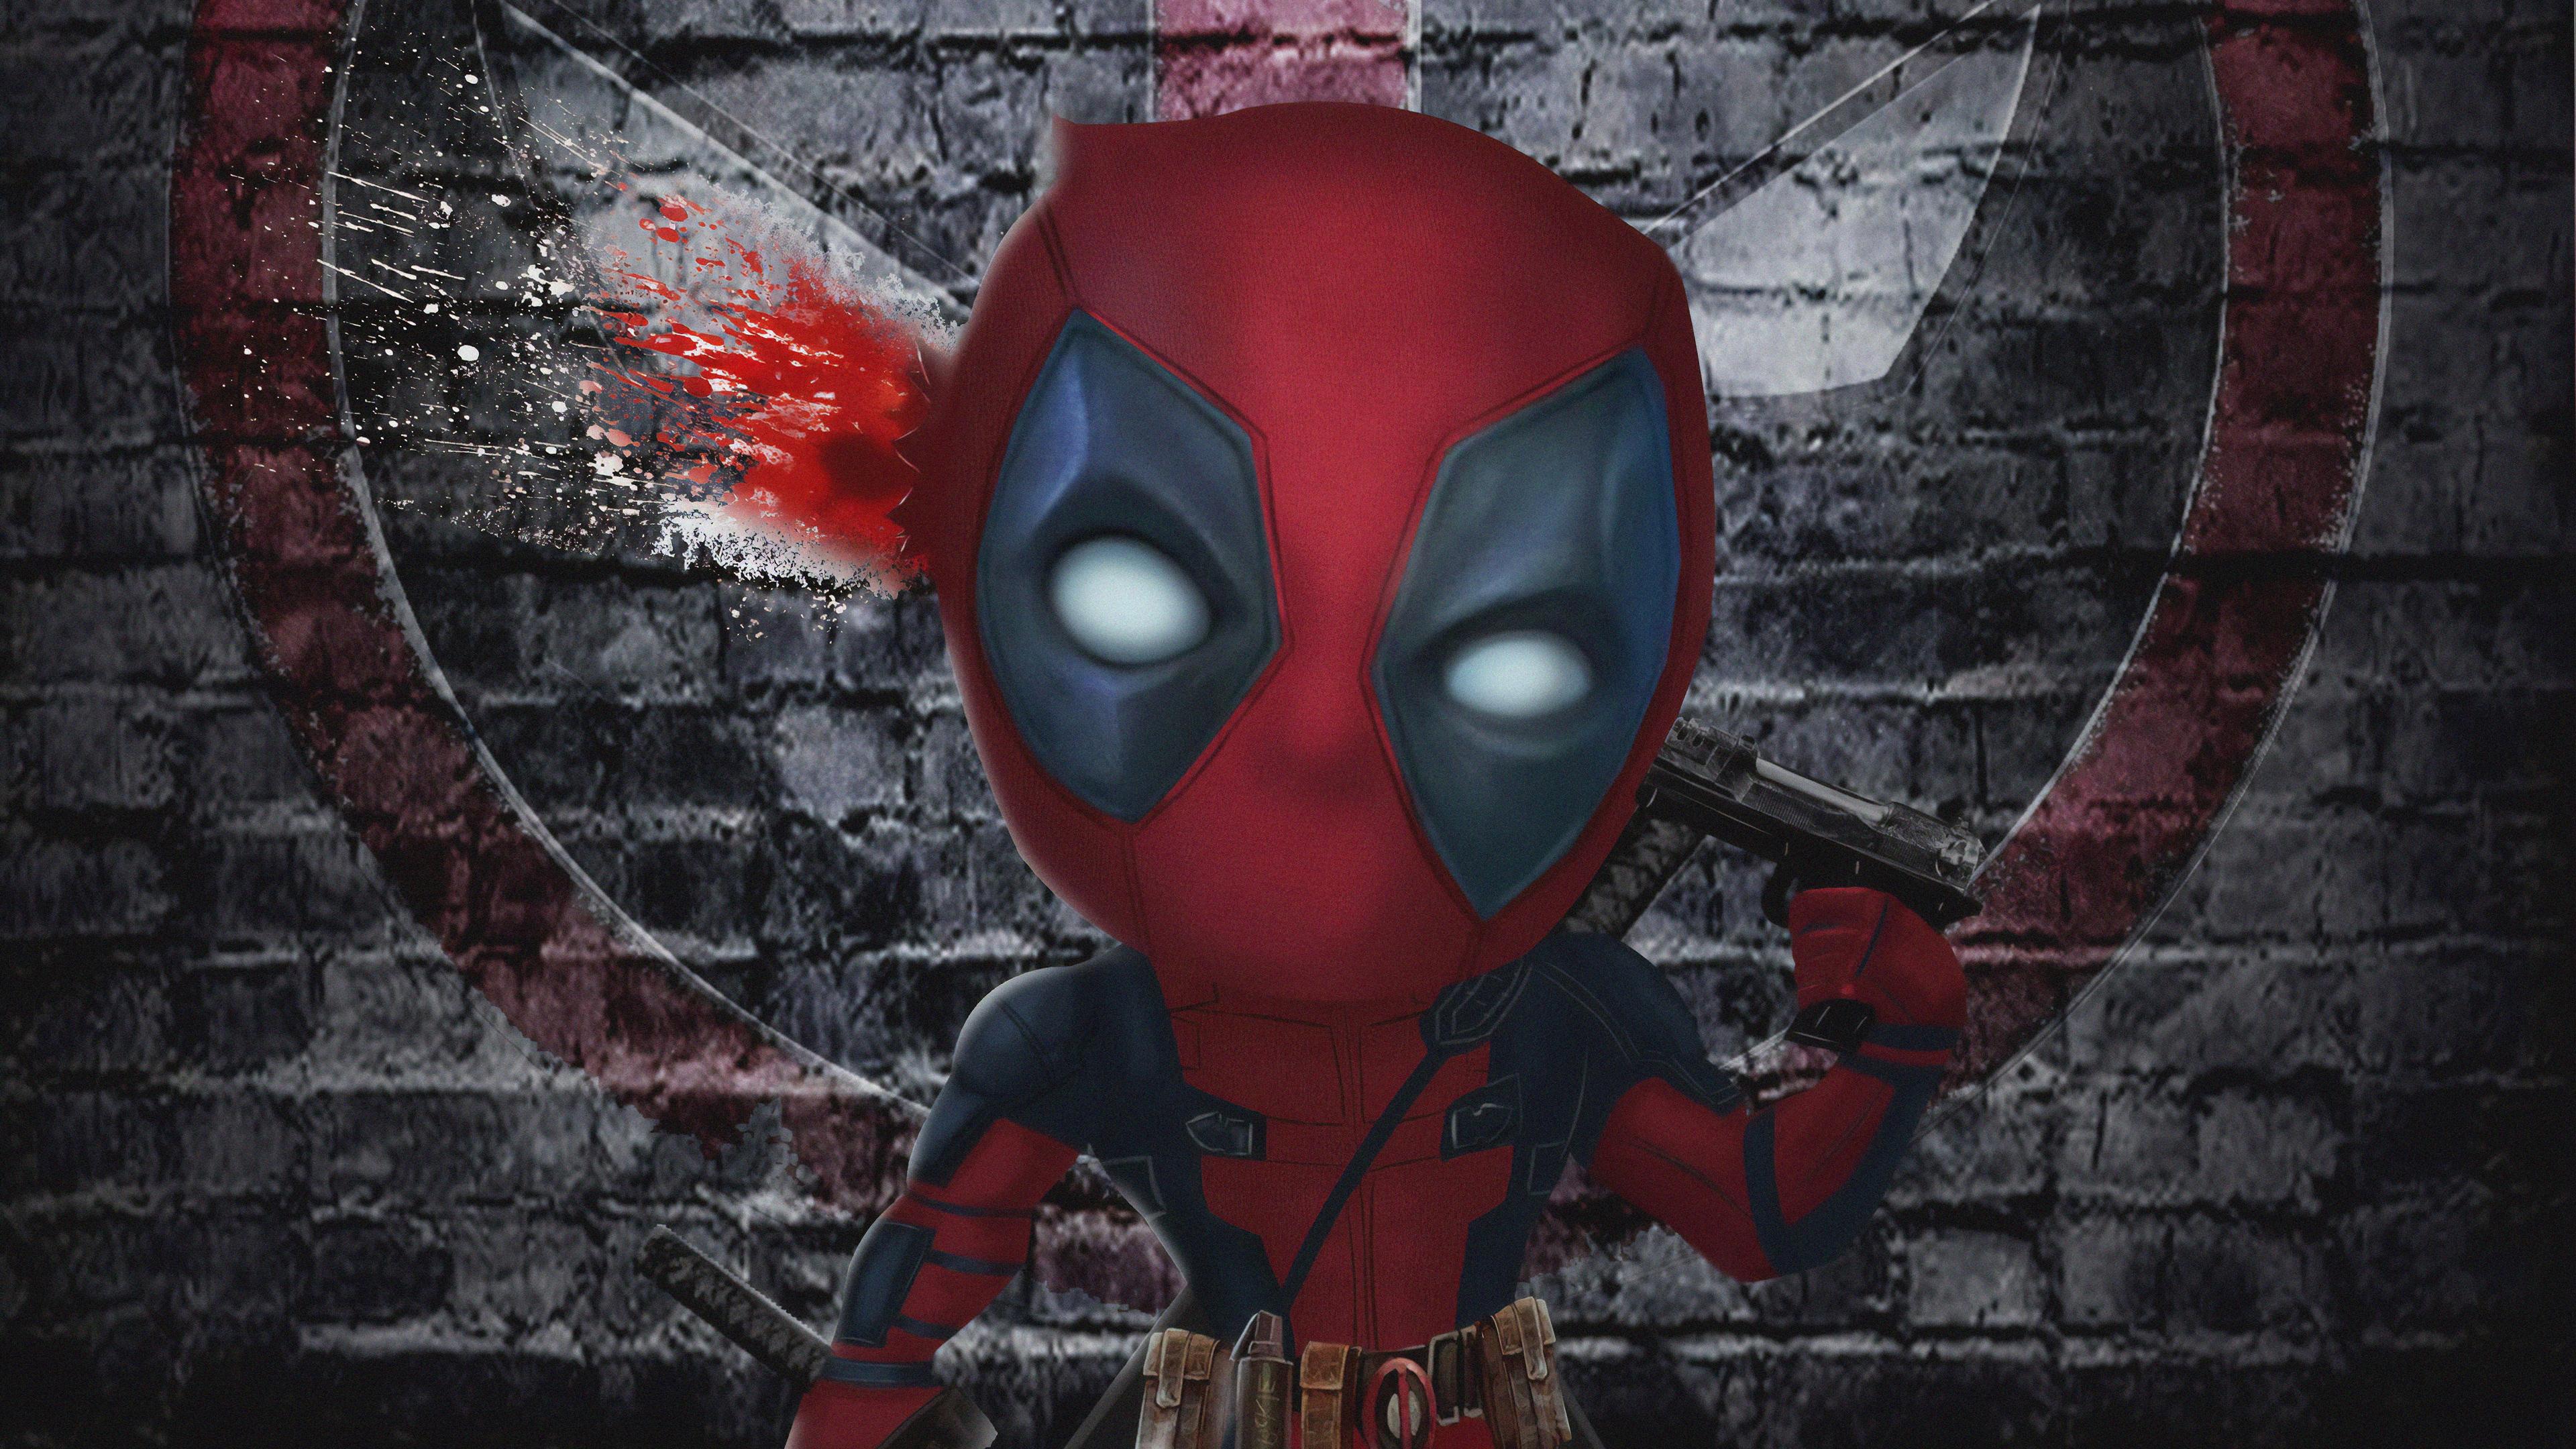 chibi deadpool 1563220157 - Chibi Deadpool - superheroes wallpapers, hd-wallpapers, digital art wallpapers, deadpool wallpapers, artwork wallpapers, artist wallpapers, 4k-wallpapers